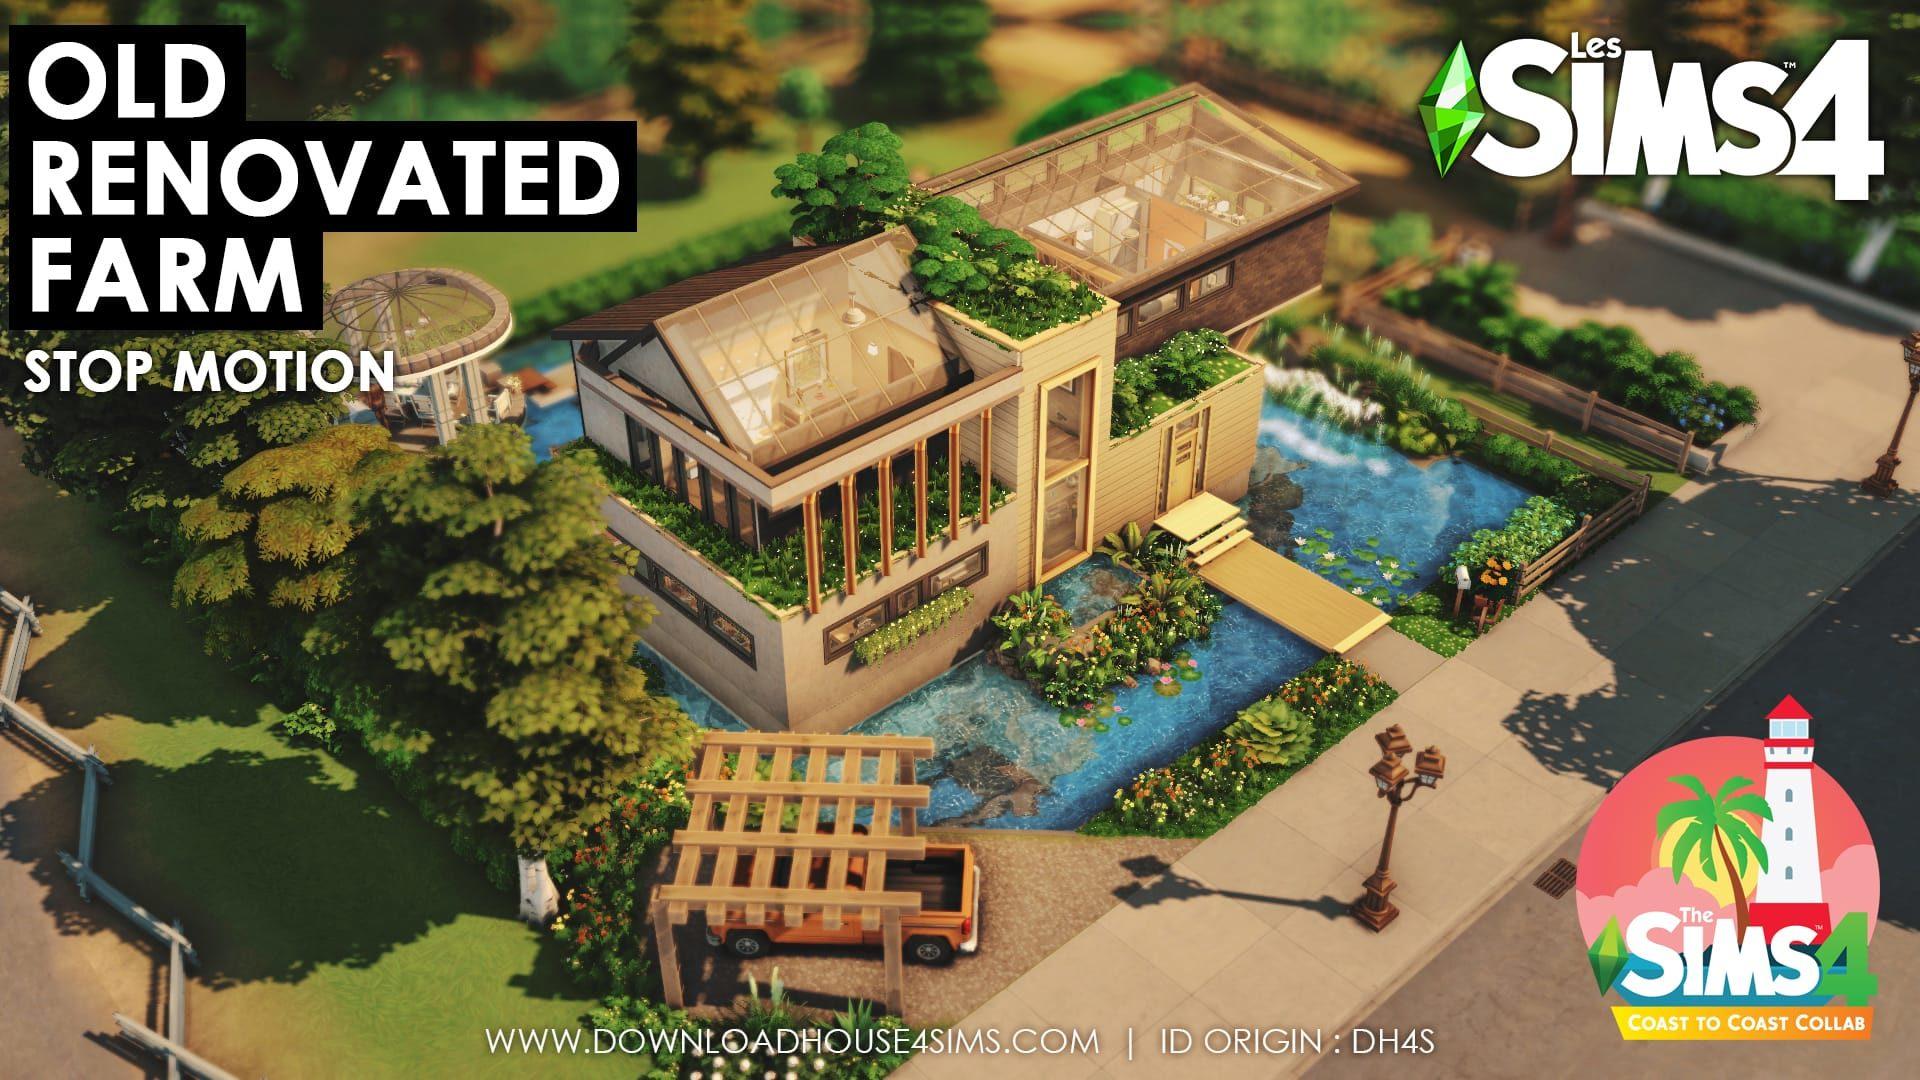 Old Renovated Farm Télécharger maison sims 4 download house (4)